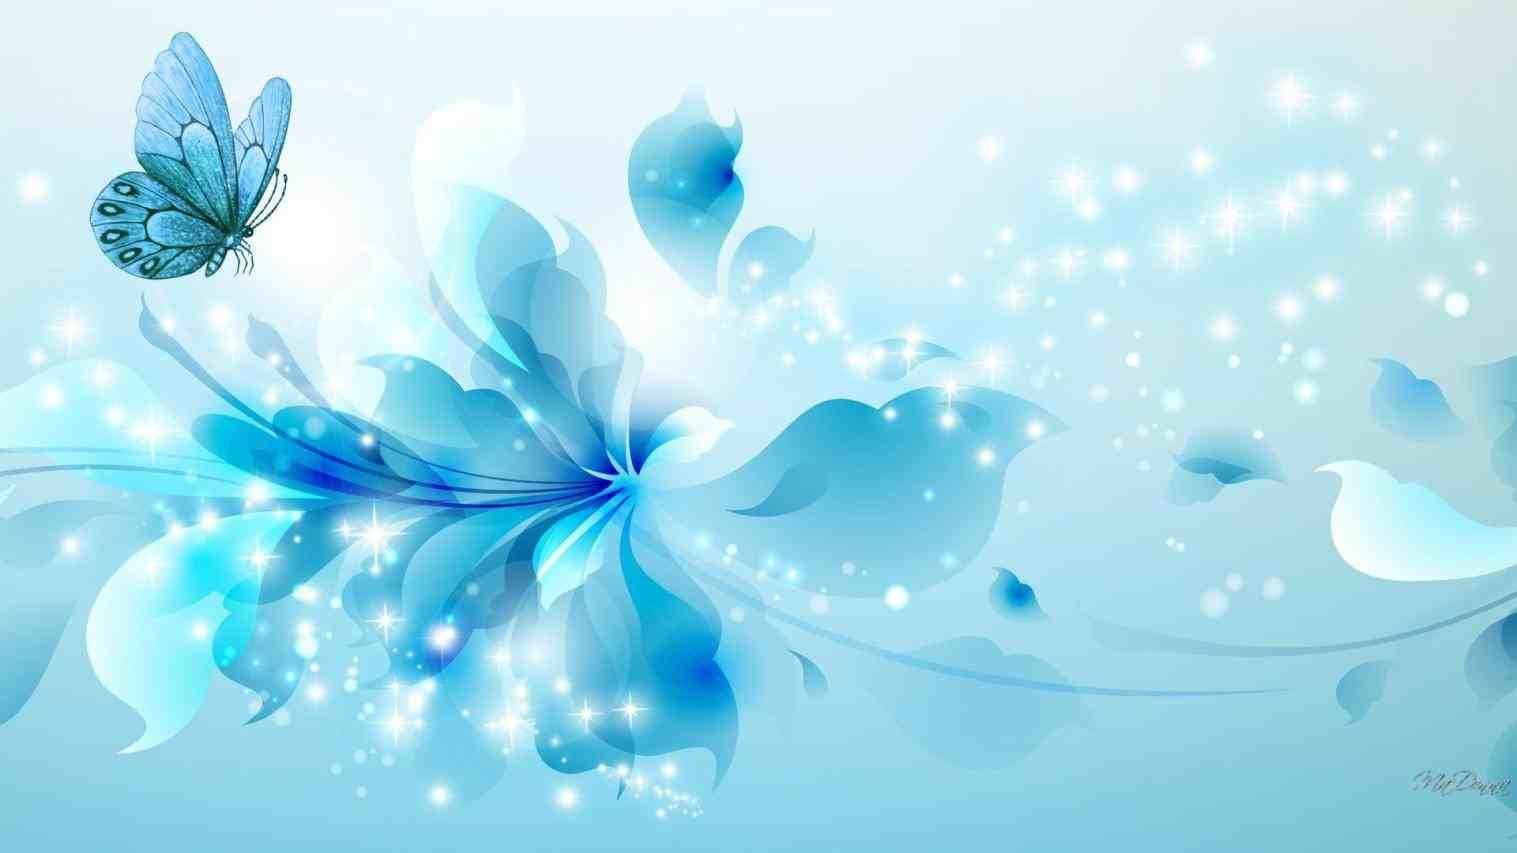 blue wedding background design Weddings Turquoise wallpaper 1517x853